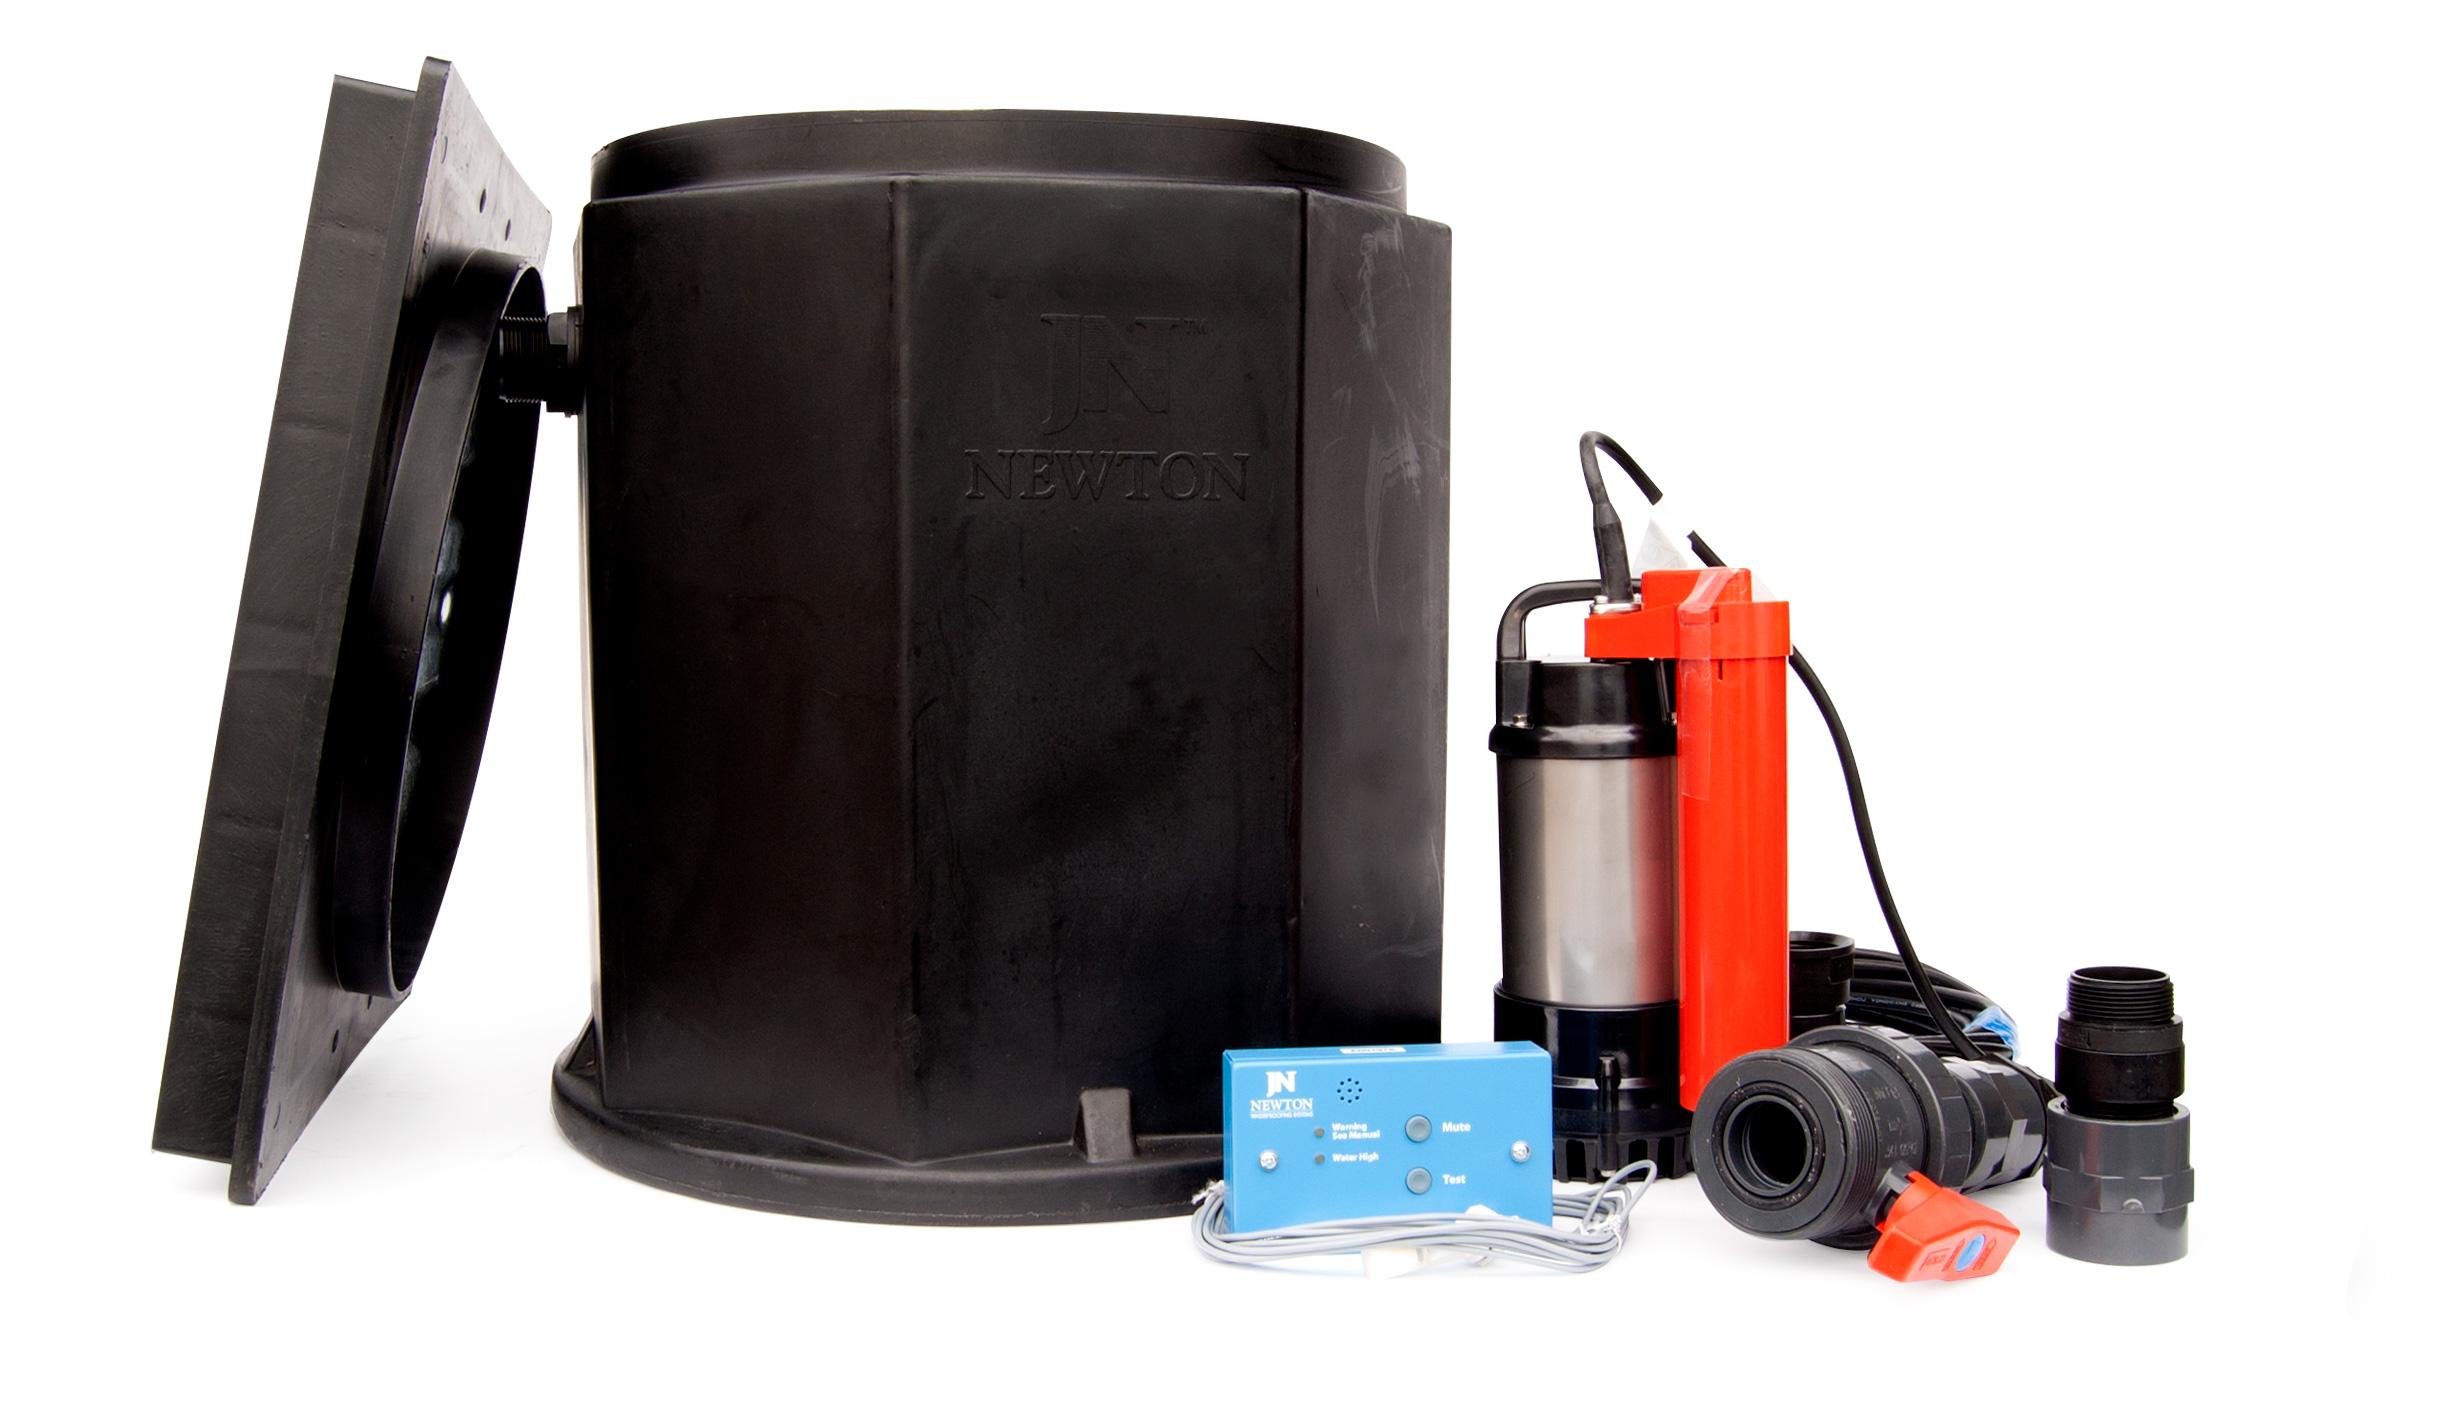 Basement Pump: Newton Titan NP150 Submersible Sump Pump with Alarm